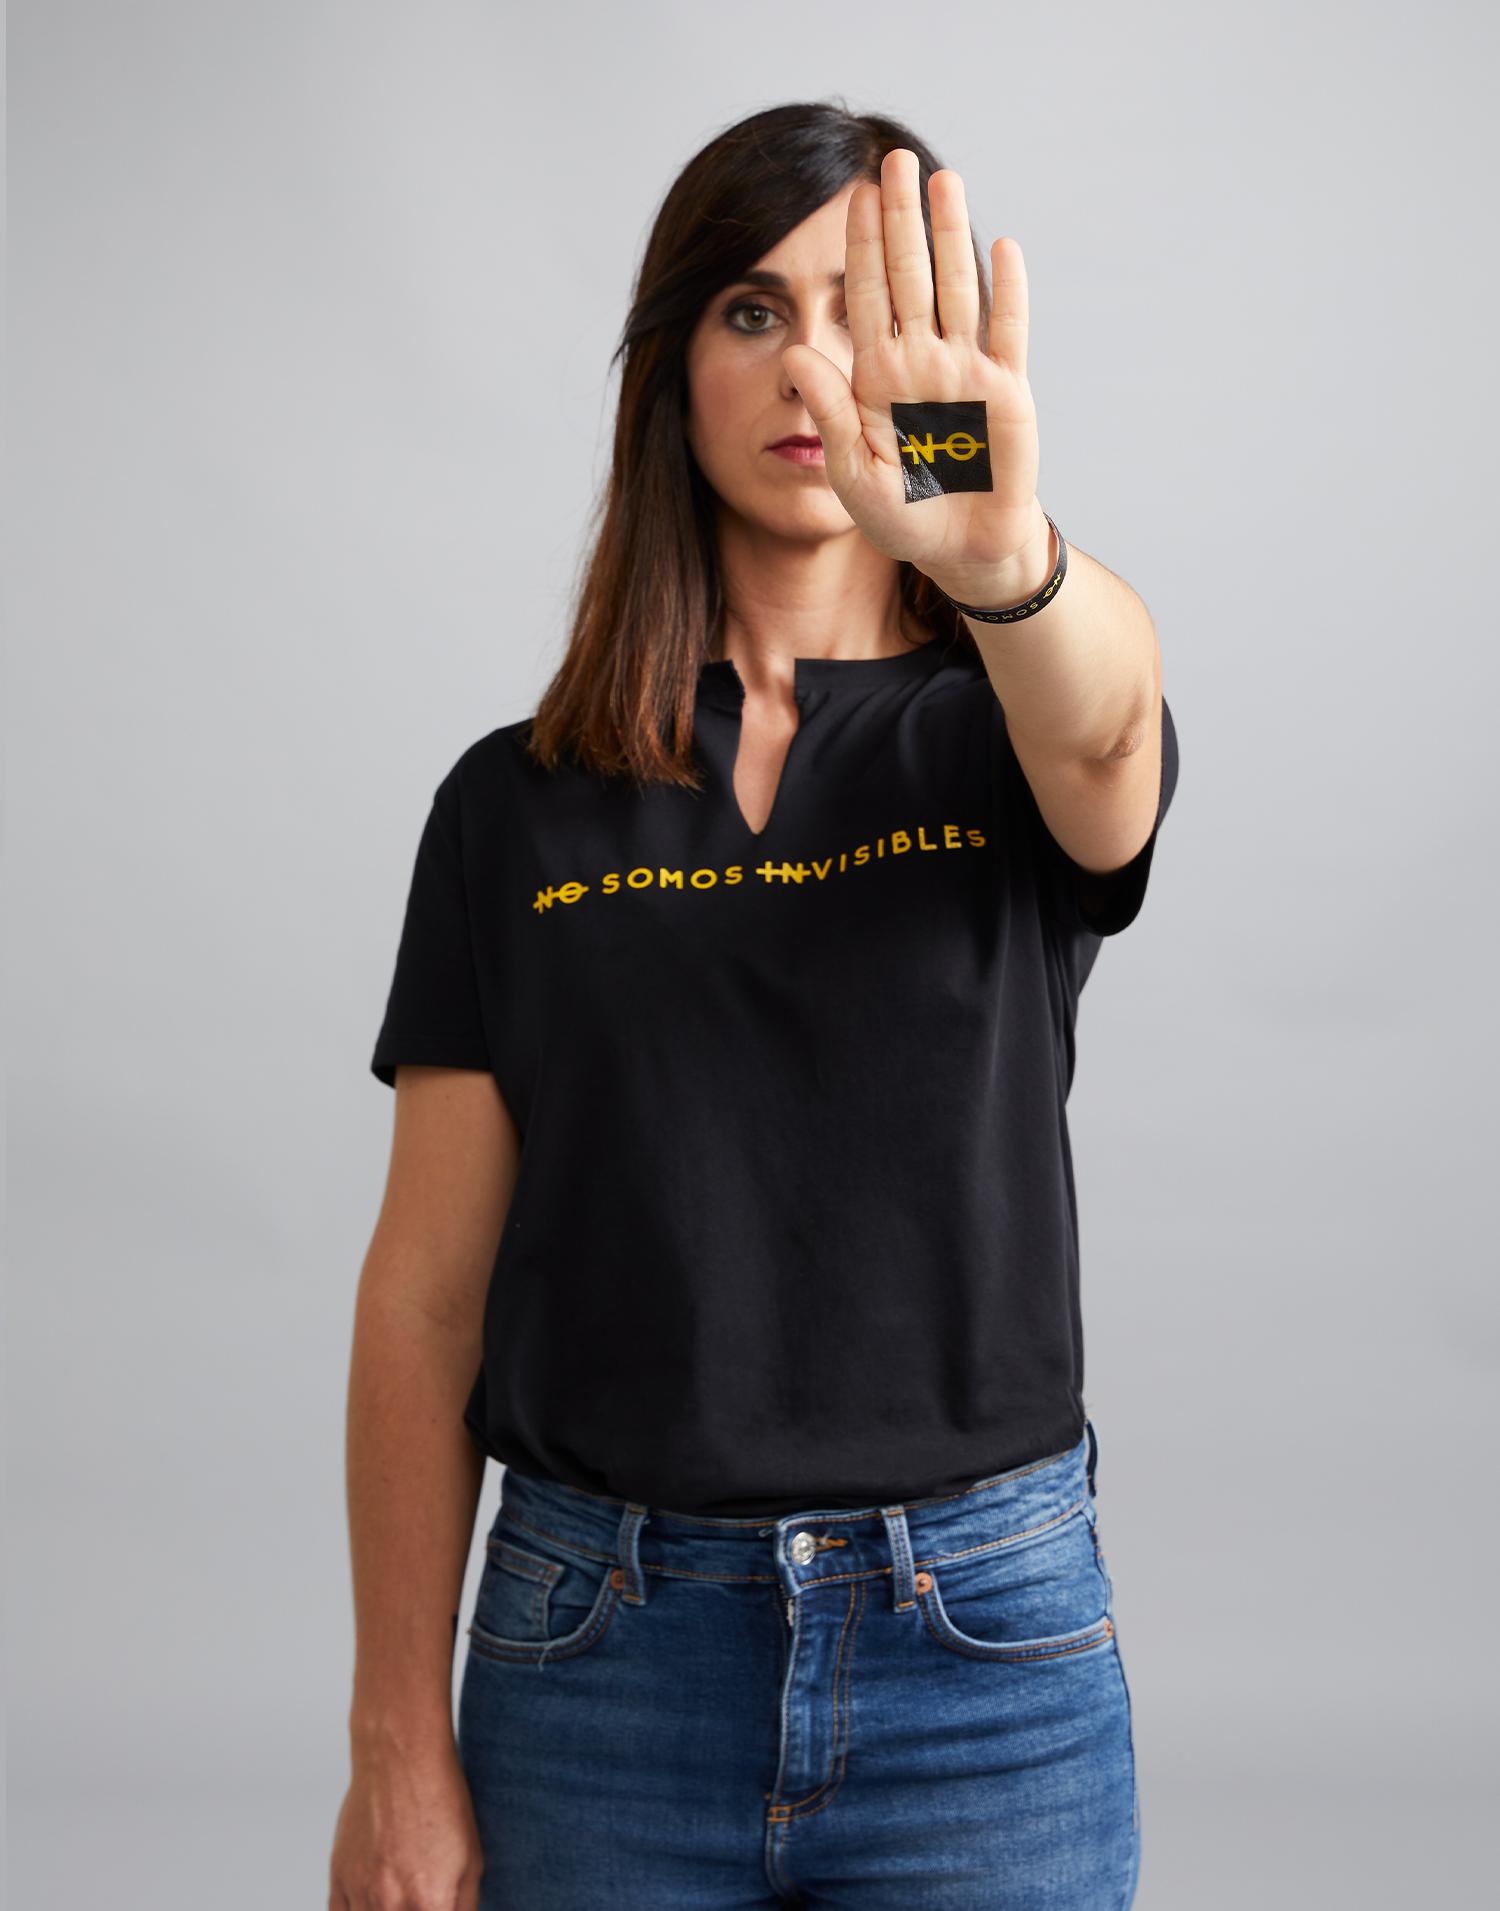 Camiseta negra 'No somos invisibles'